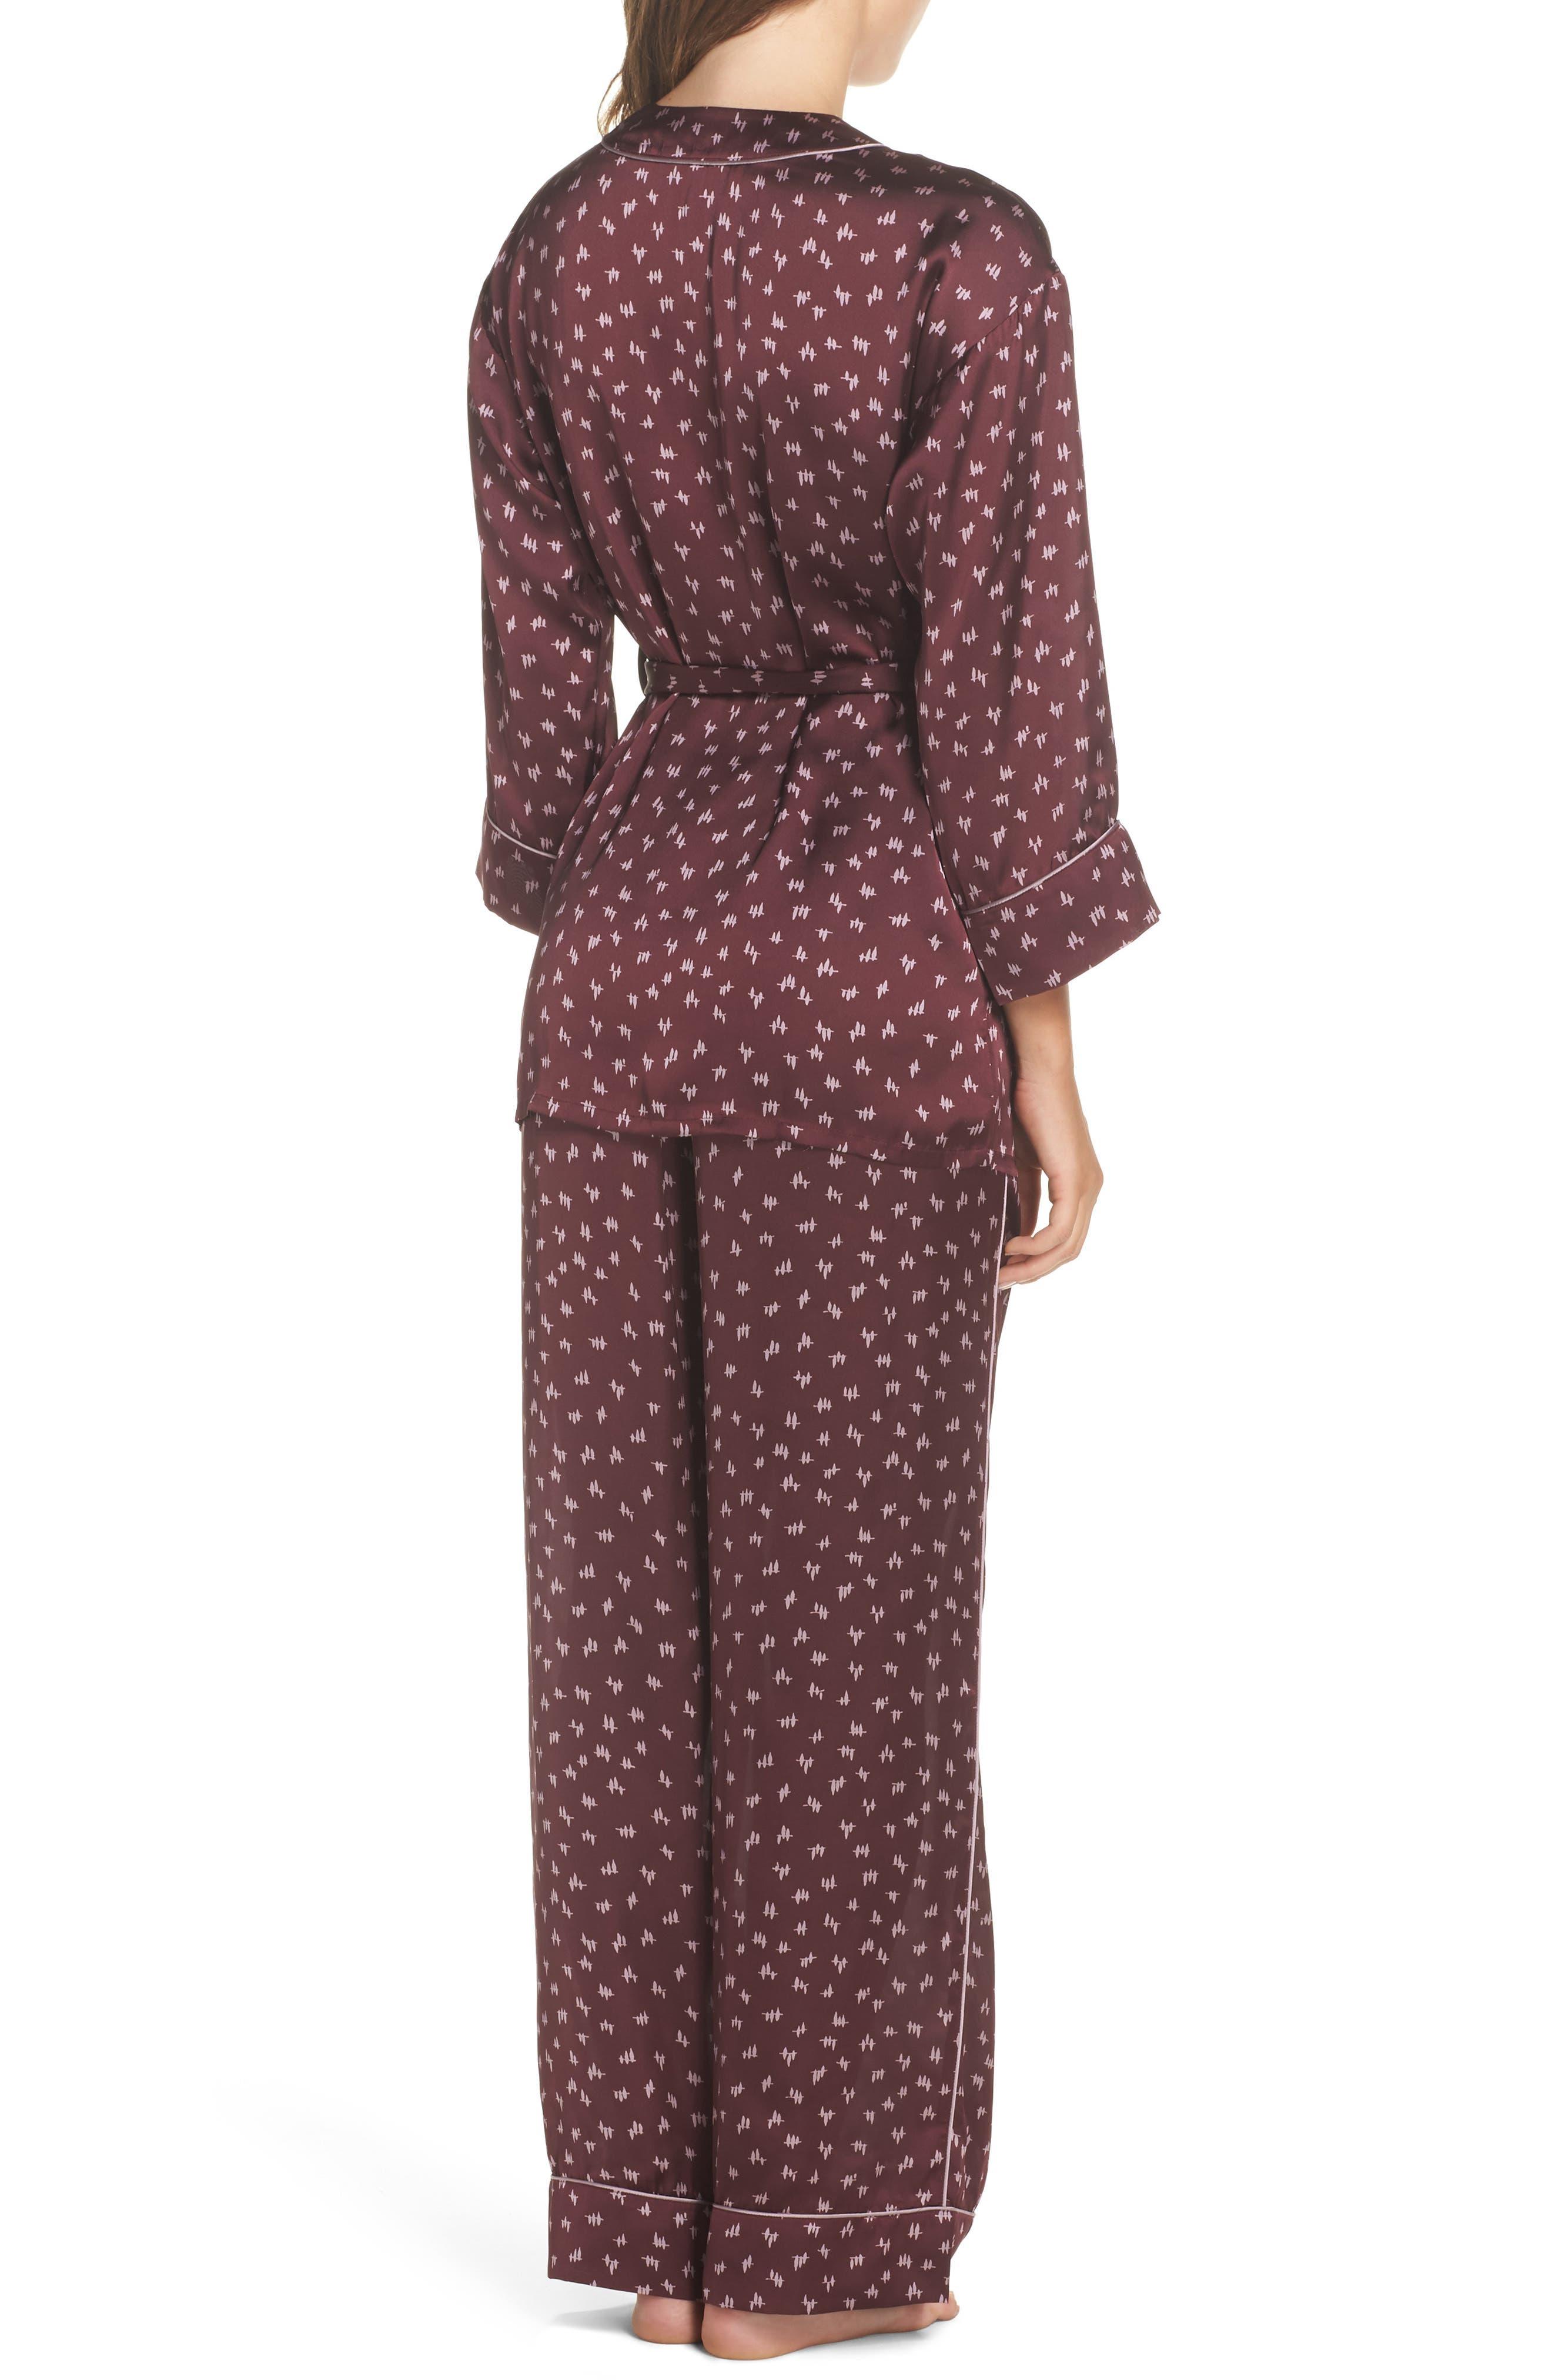 Wrap Satin Pajamas,                             Alternate thumbnail 2, color,                             930